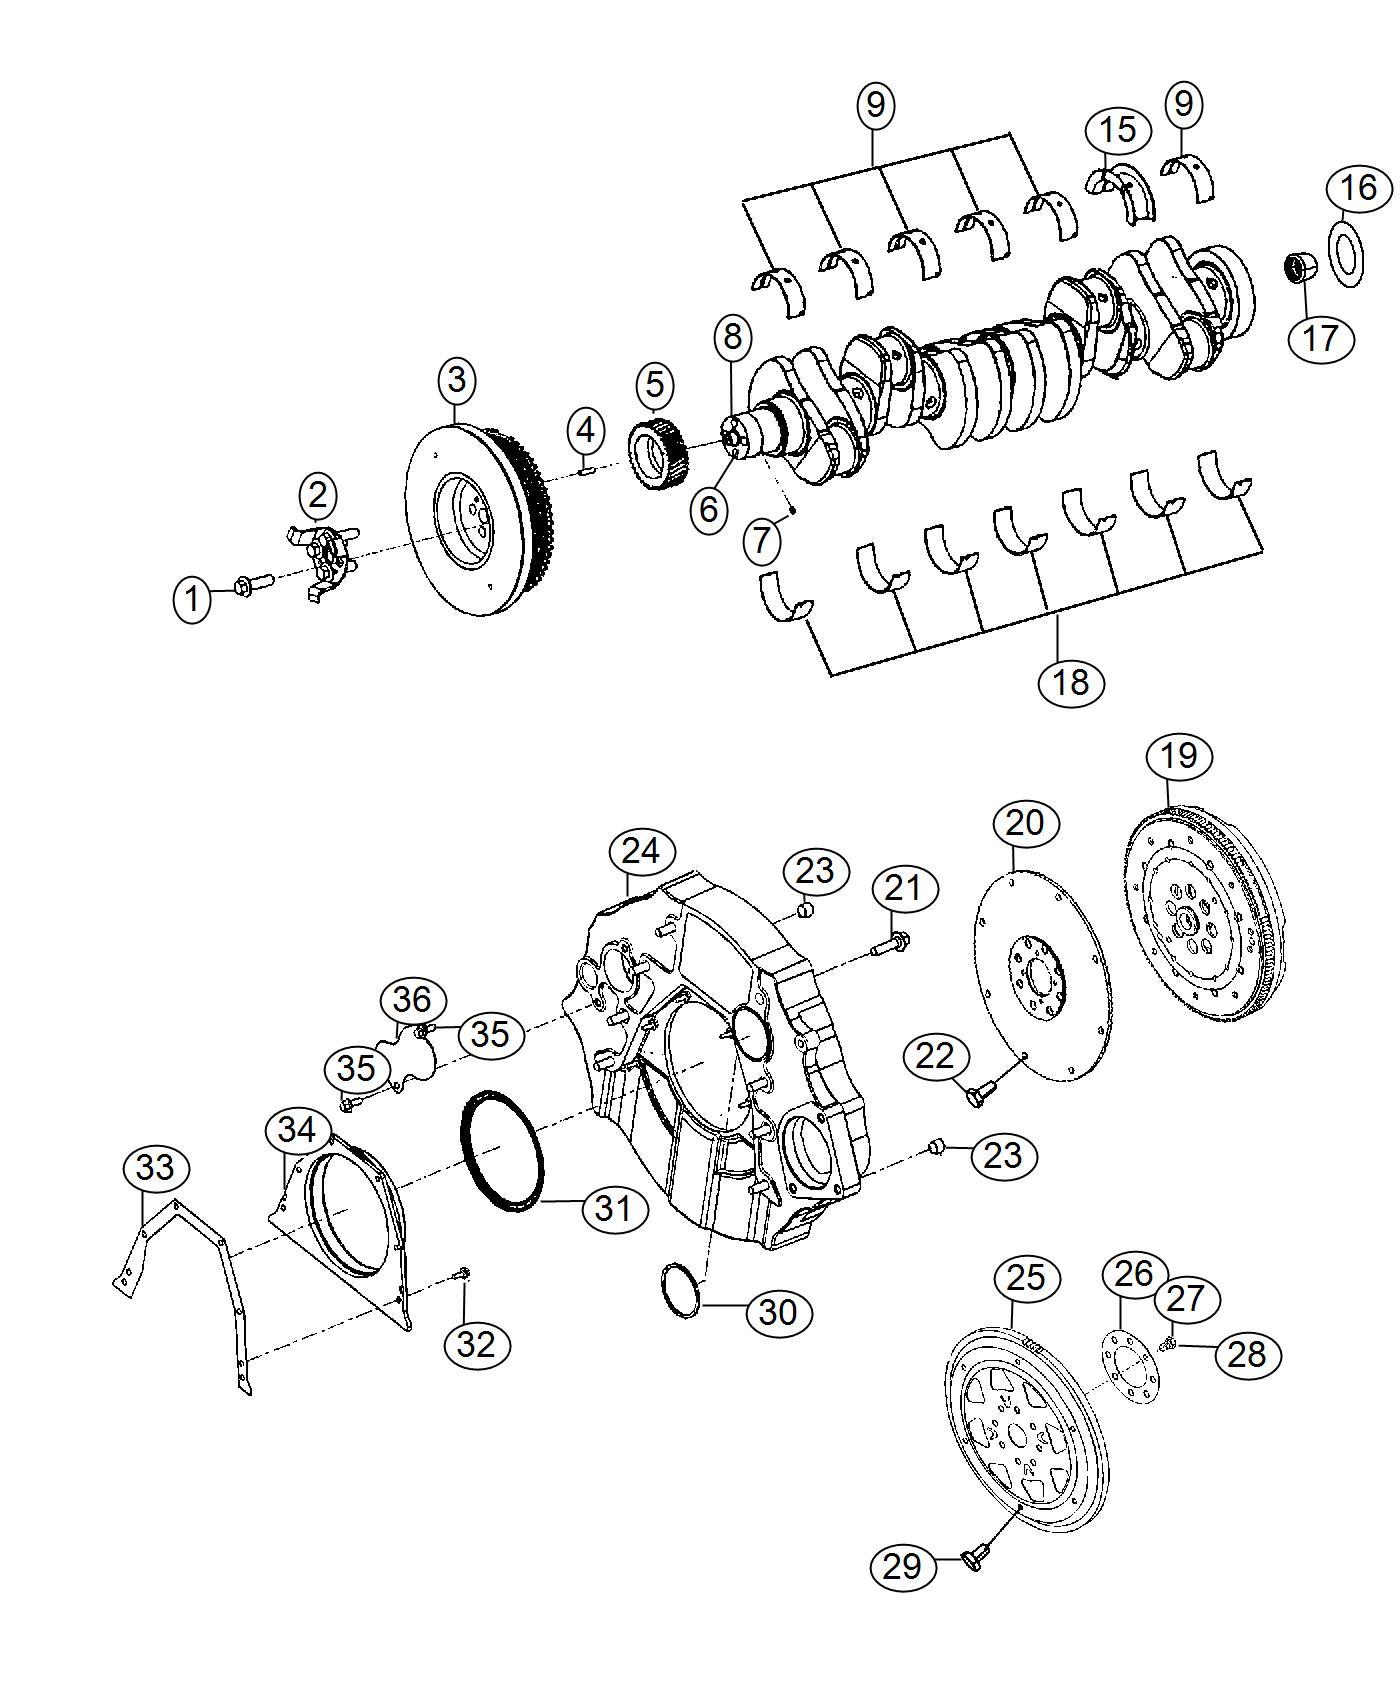 Ram Seal Crankshaft Oil Rear Automatic